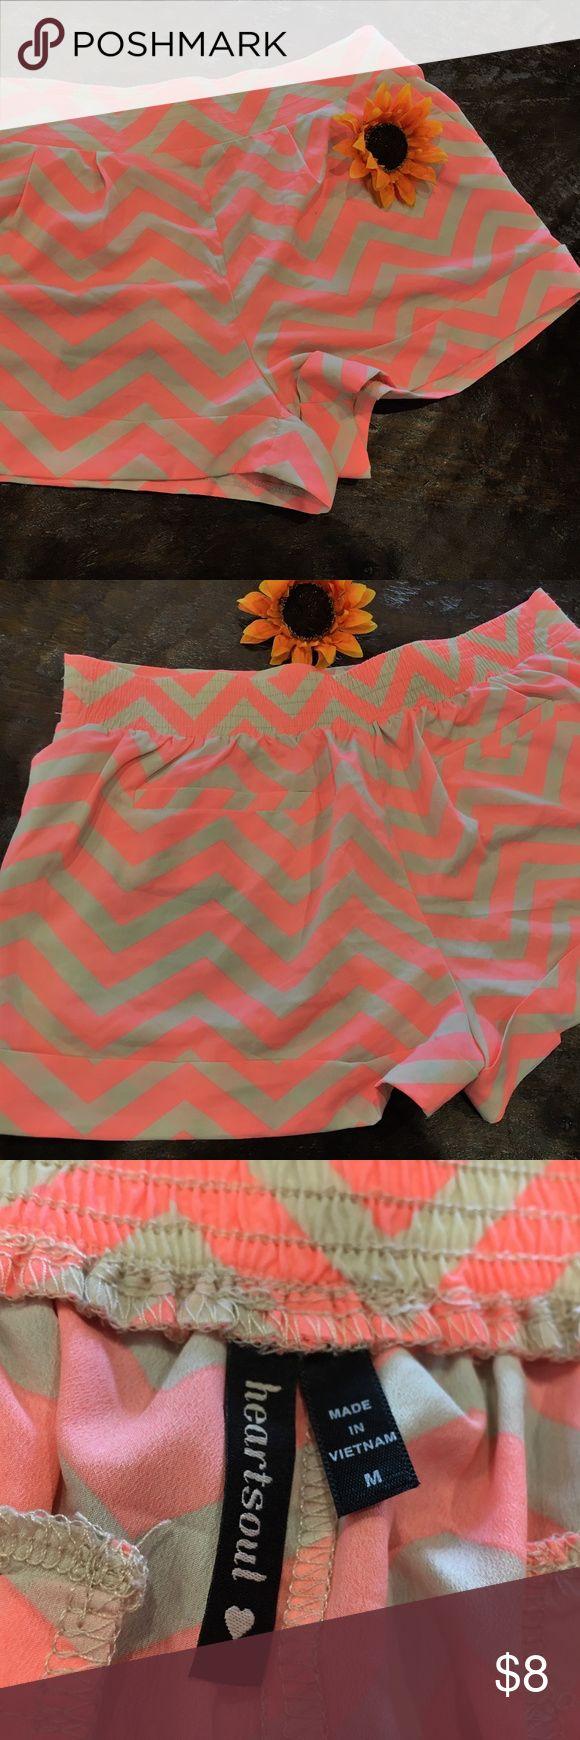 Tan/Coral Chevron shorts Super cute tan/coral Chevron shorts w/ elastic waist.  Super lightweight HeartSoul Shorts